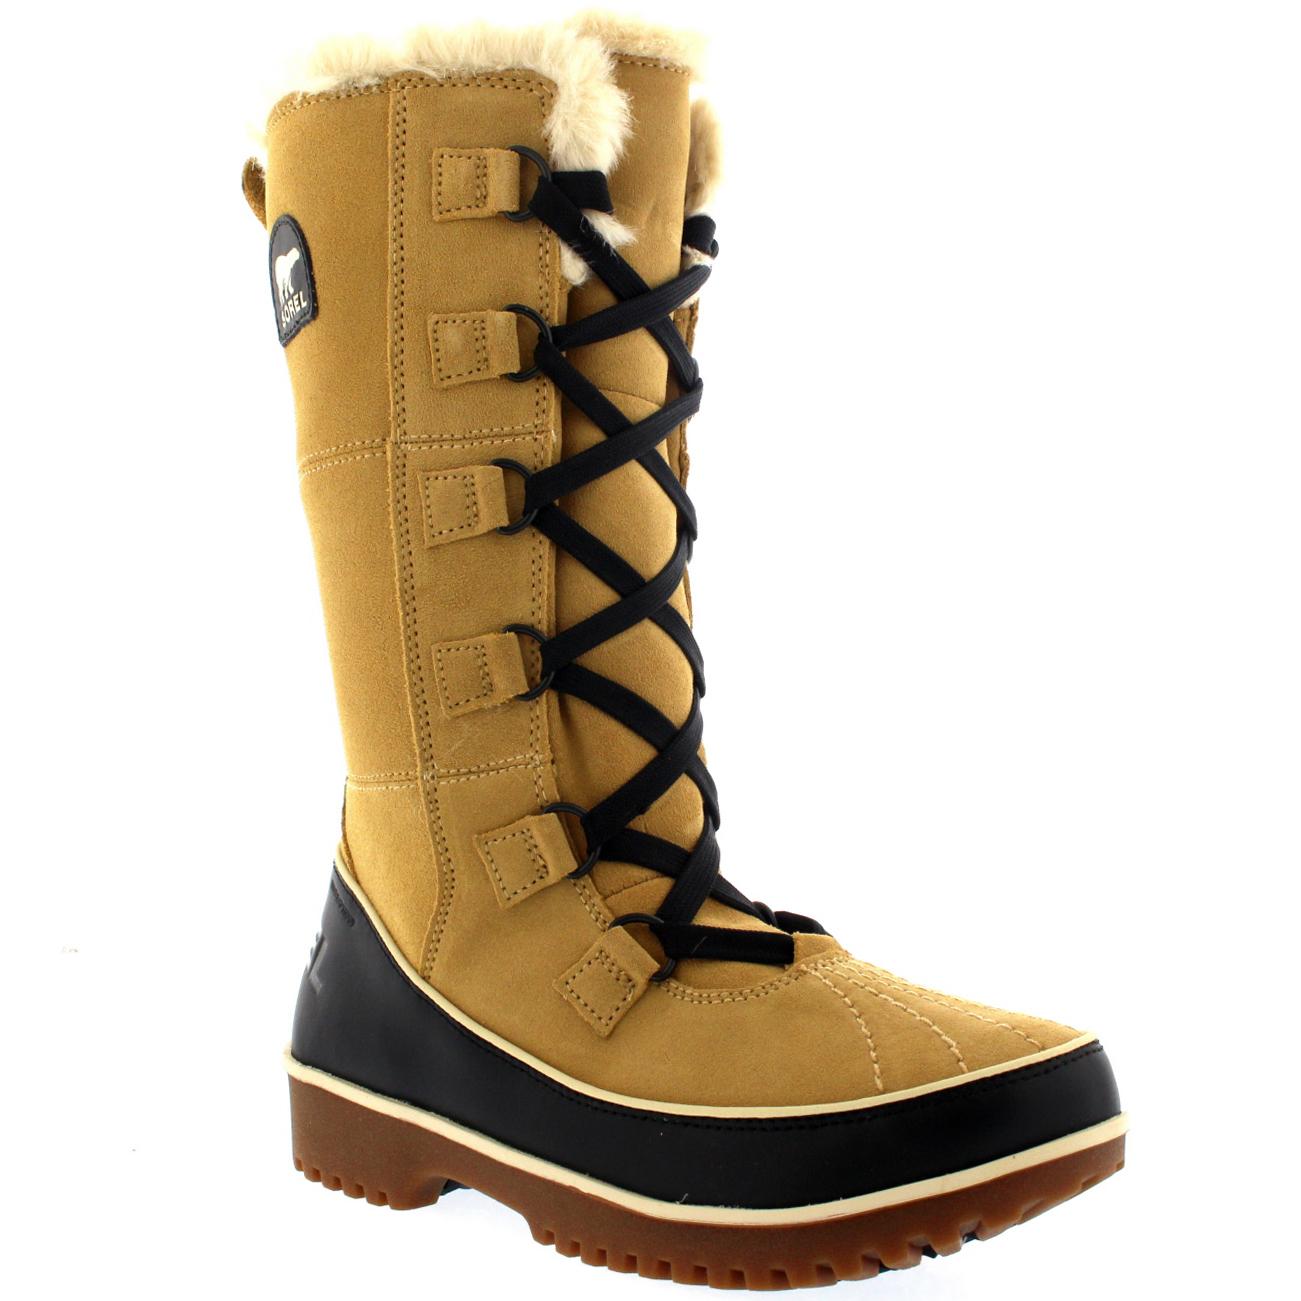 a8ad48772ac16 Details about Womens Sorel Tivoli High II Waterproof Winter Rain Mid Calf  Snow Boots US 5-11